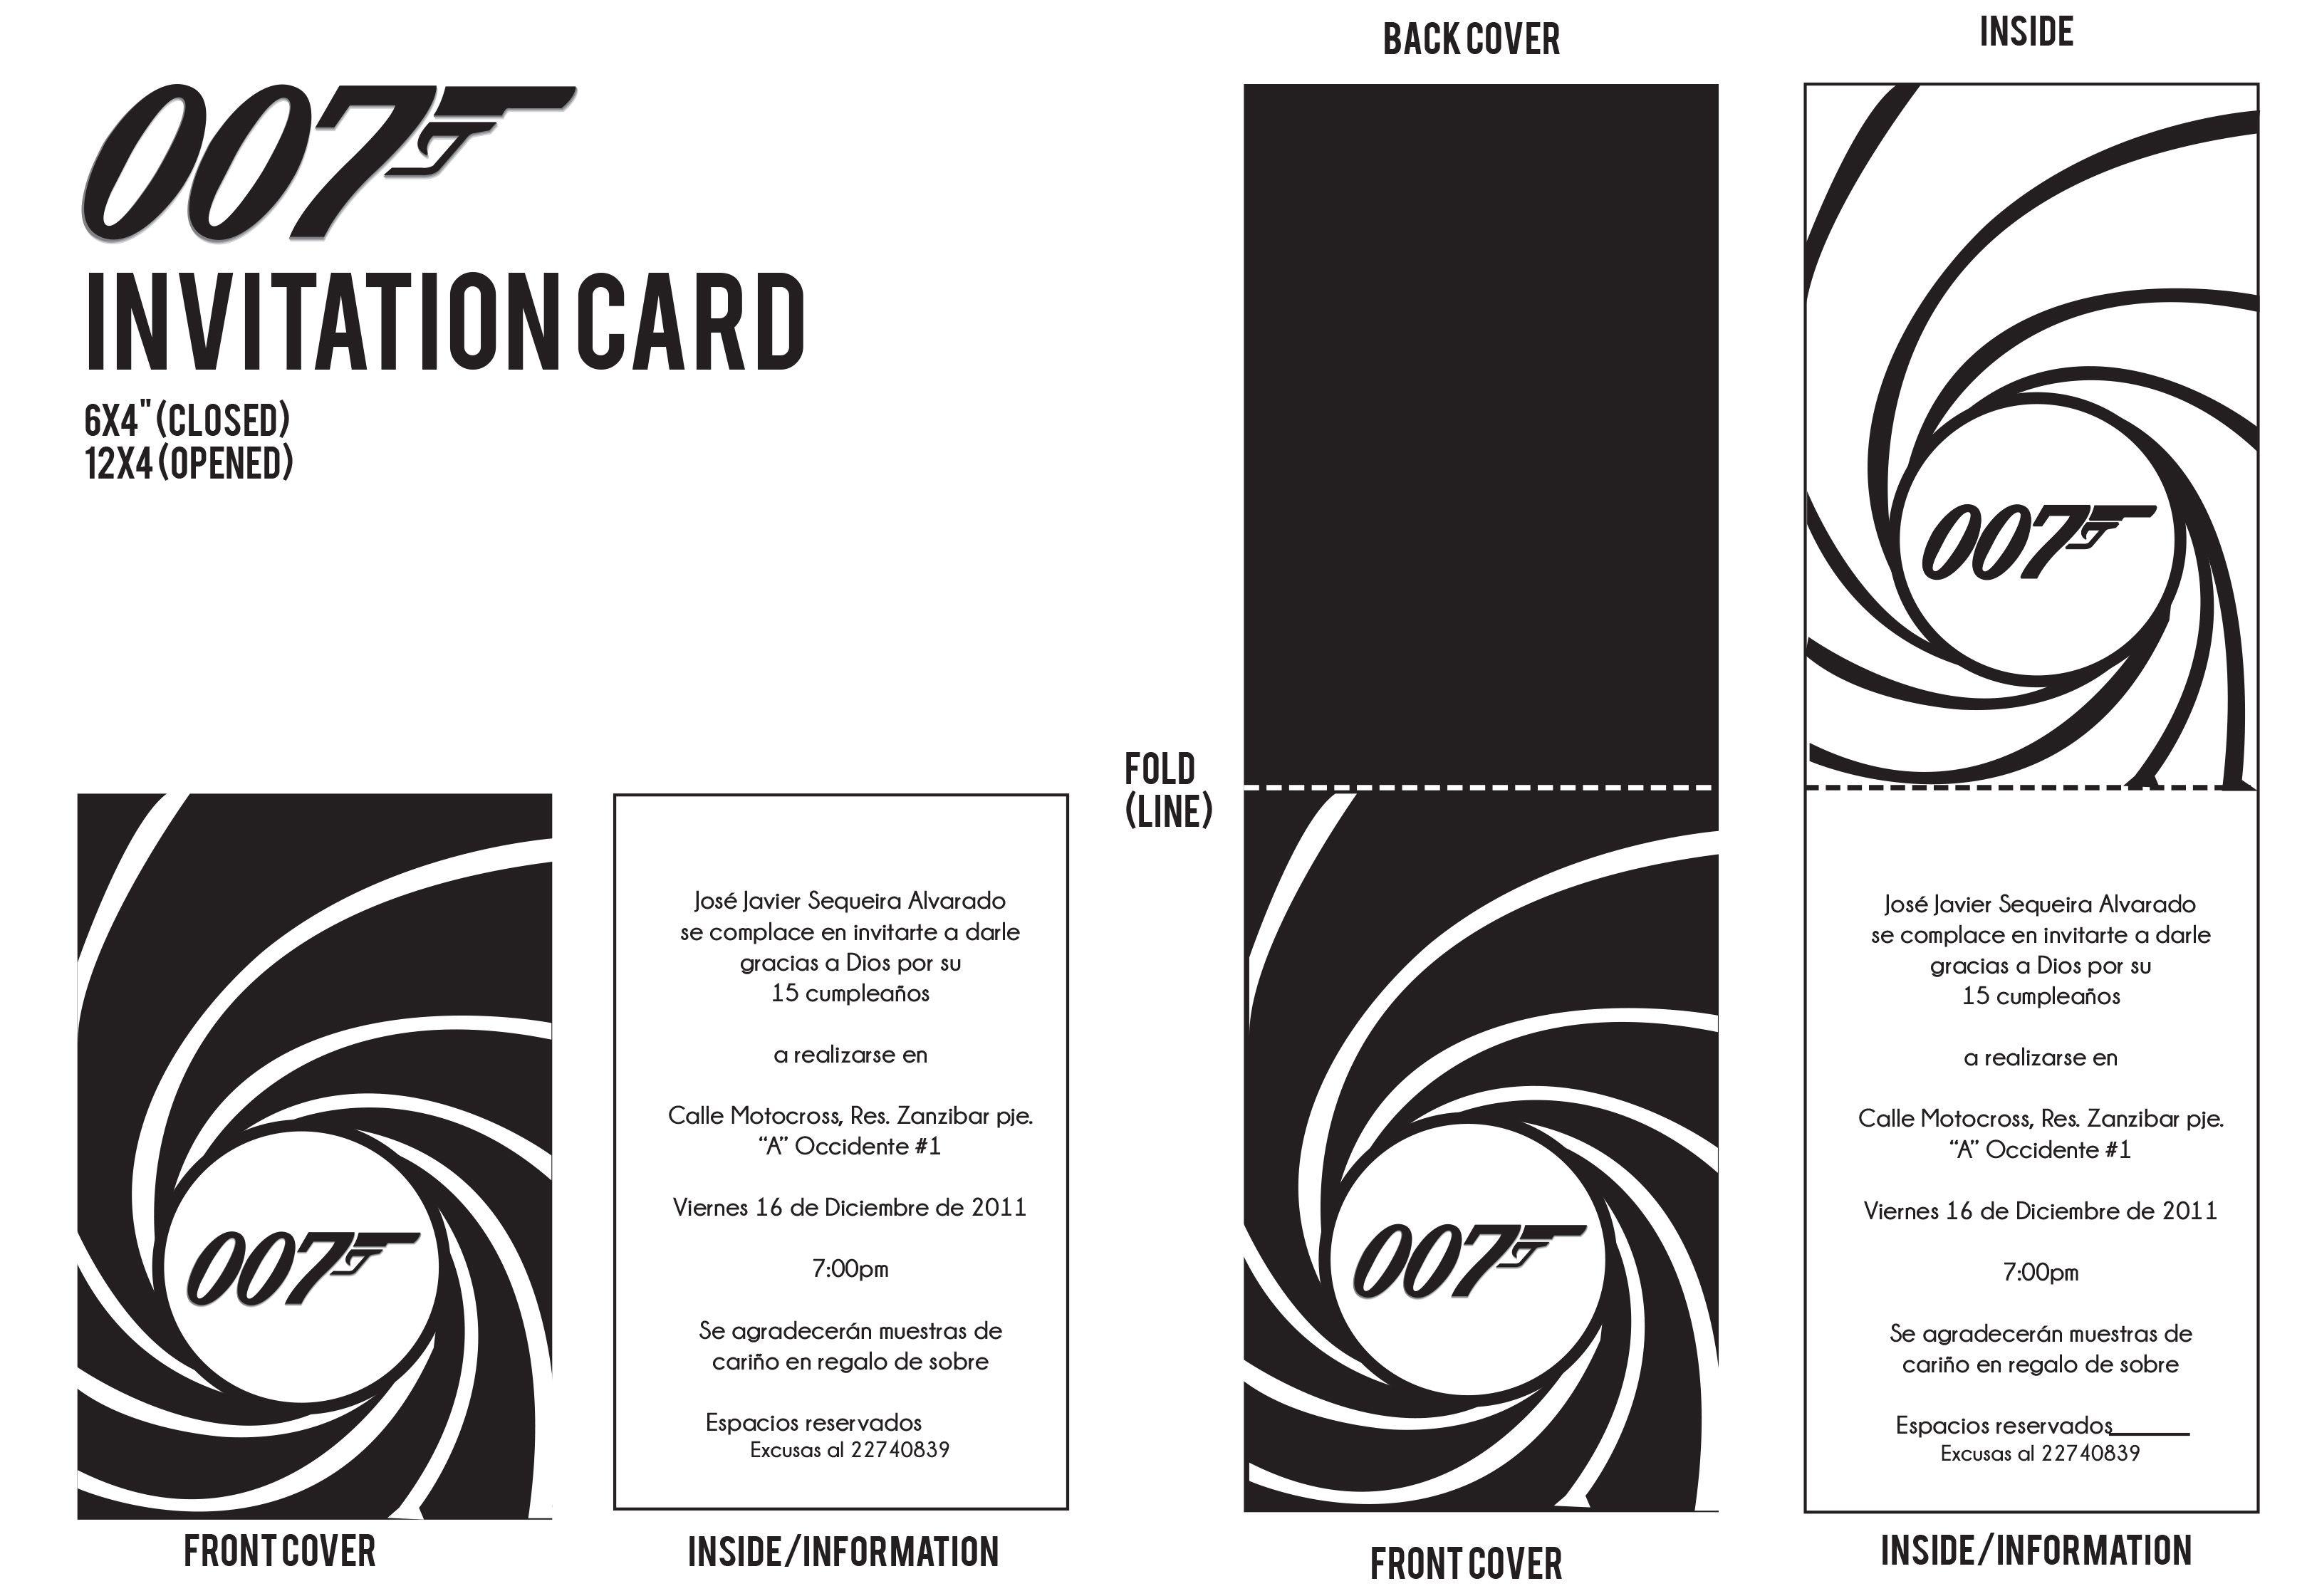 007 invitation card 007 pinterest 50th party 007 invitation card stopboris Choice Image